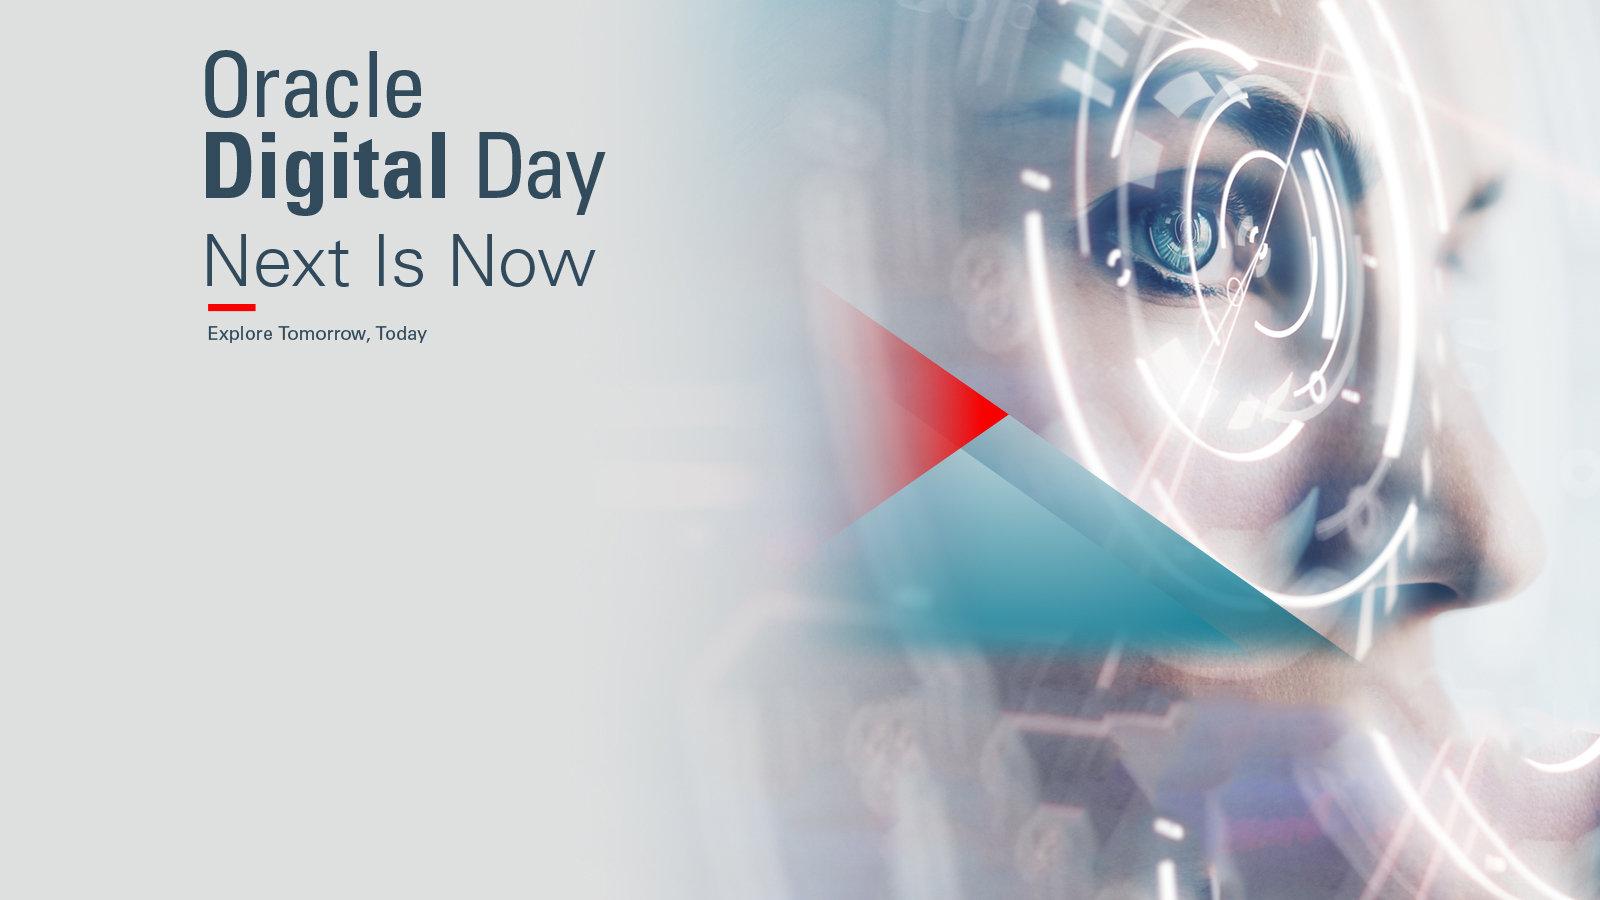 Oracle Digital Day